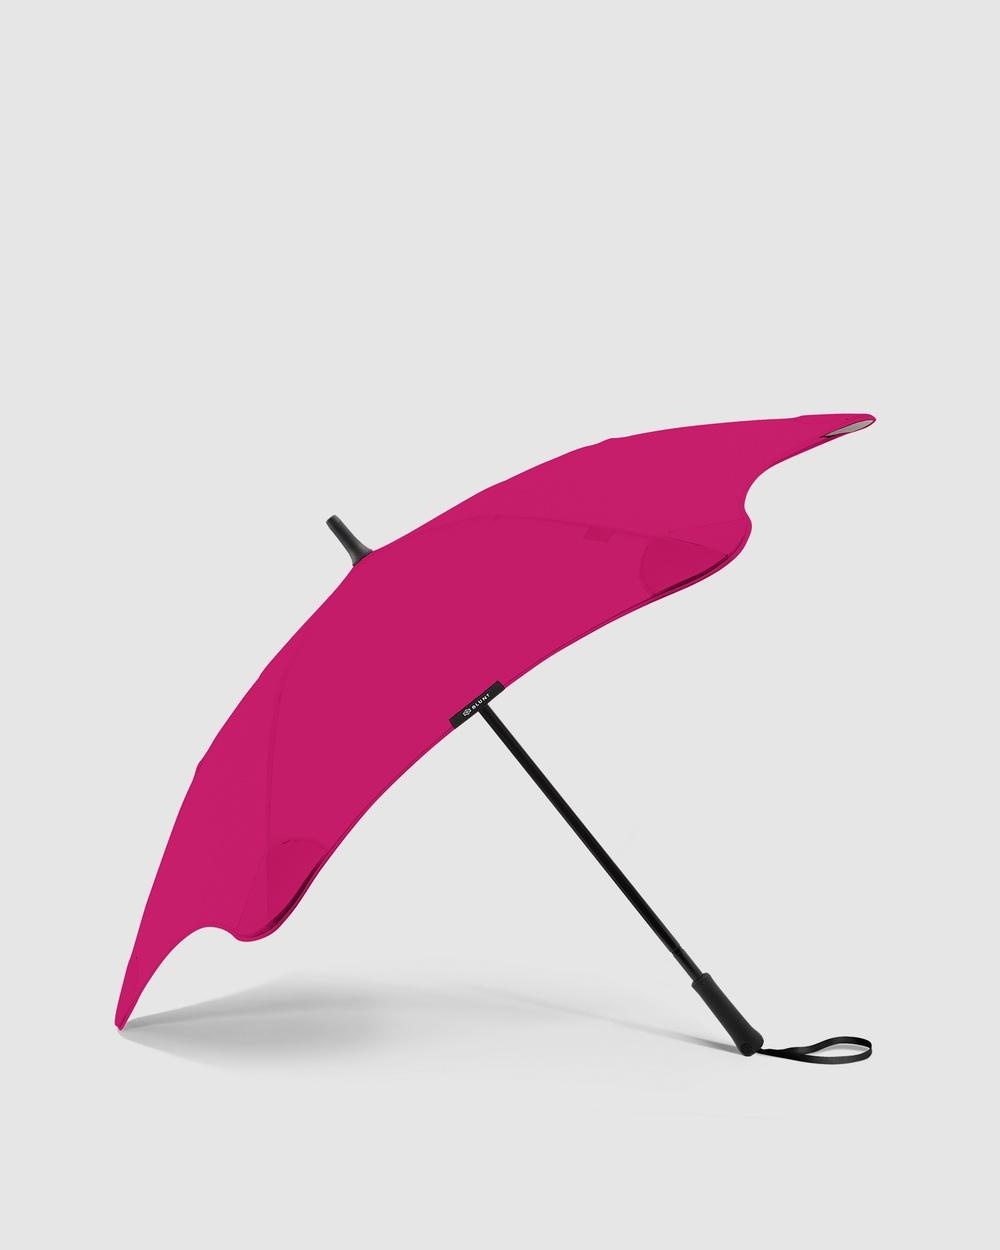 BLUNT Umbrellas Blunt Coupe Umbrella Accessories Pink